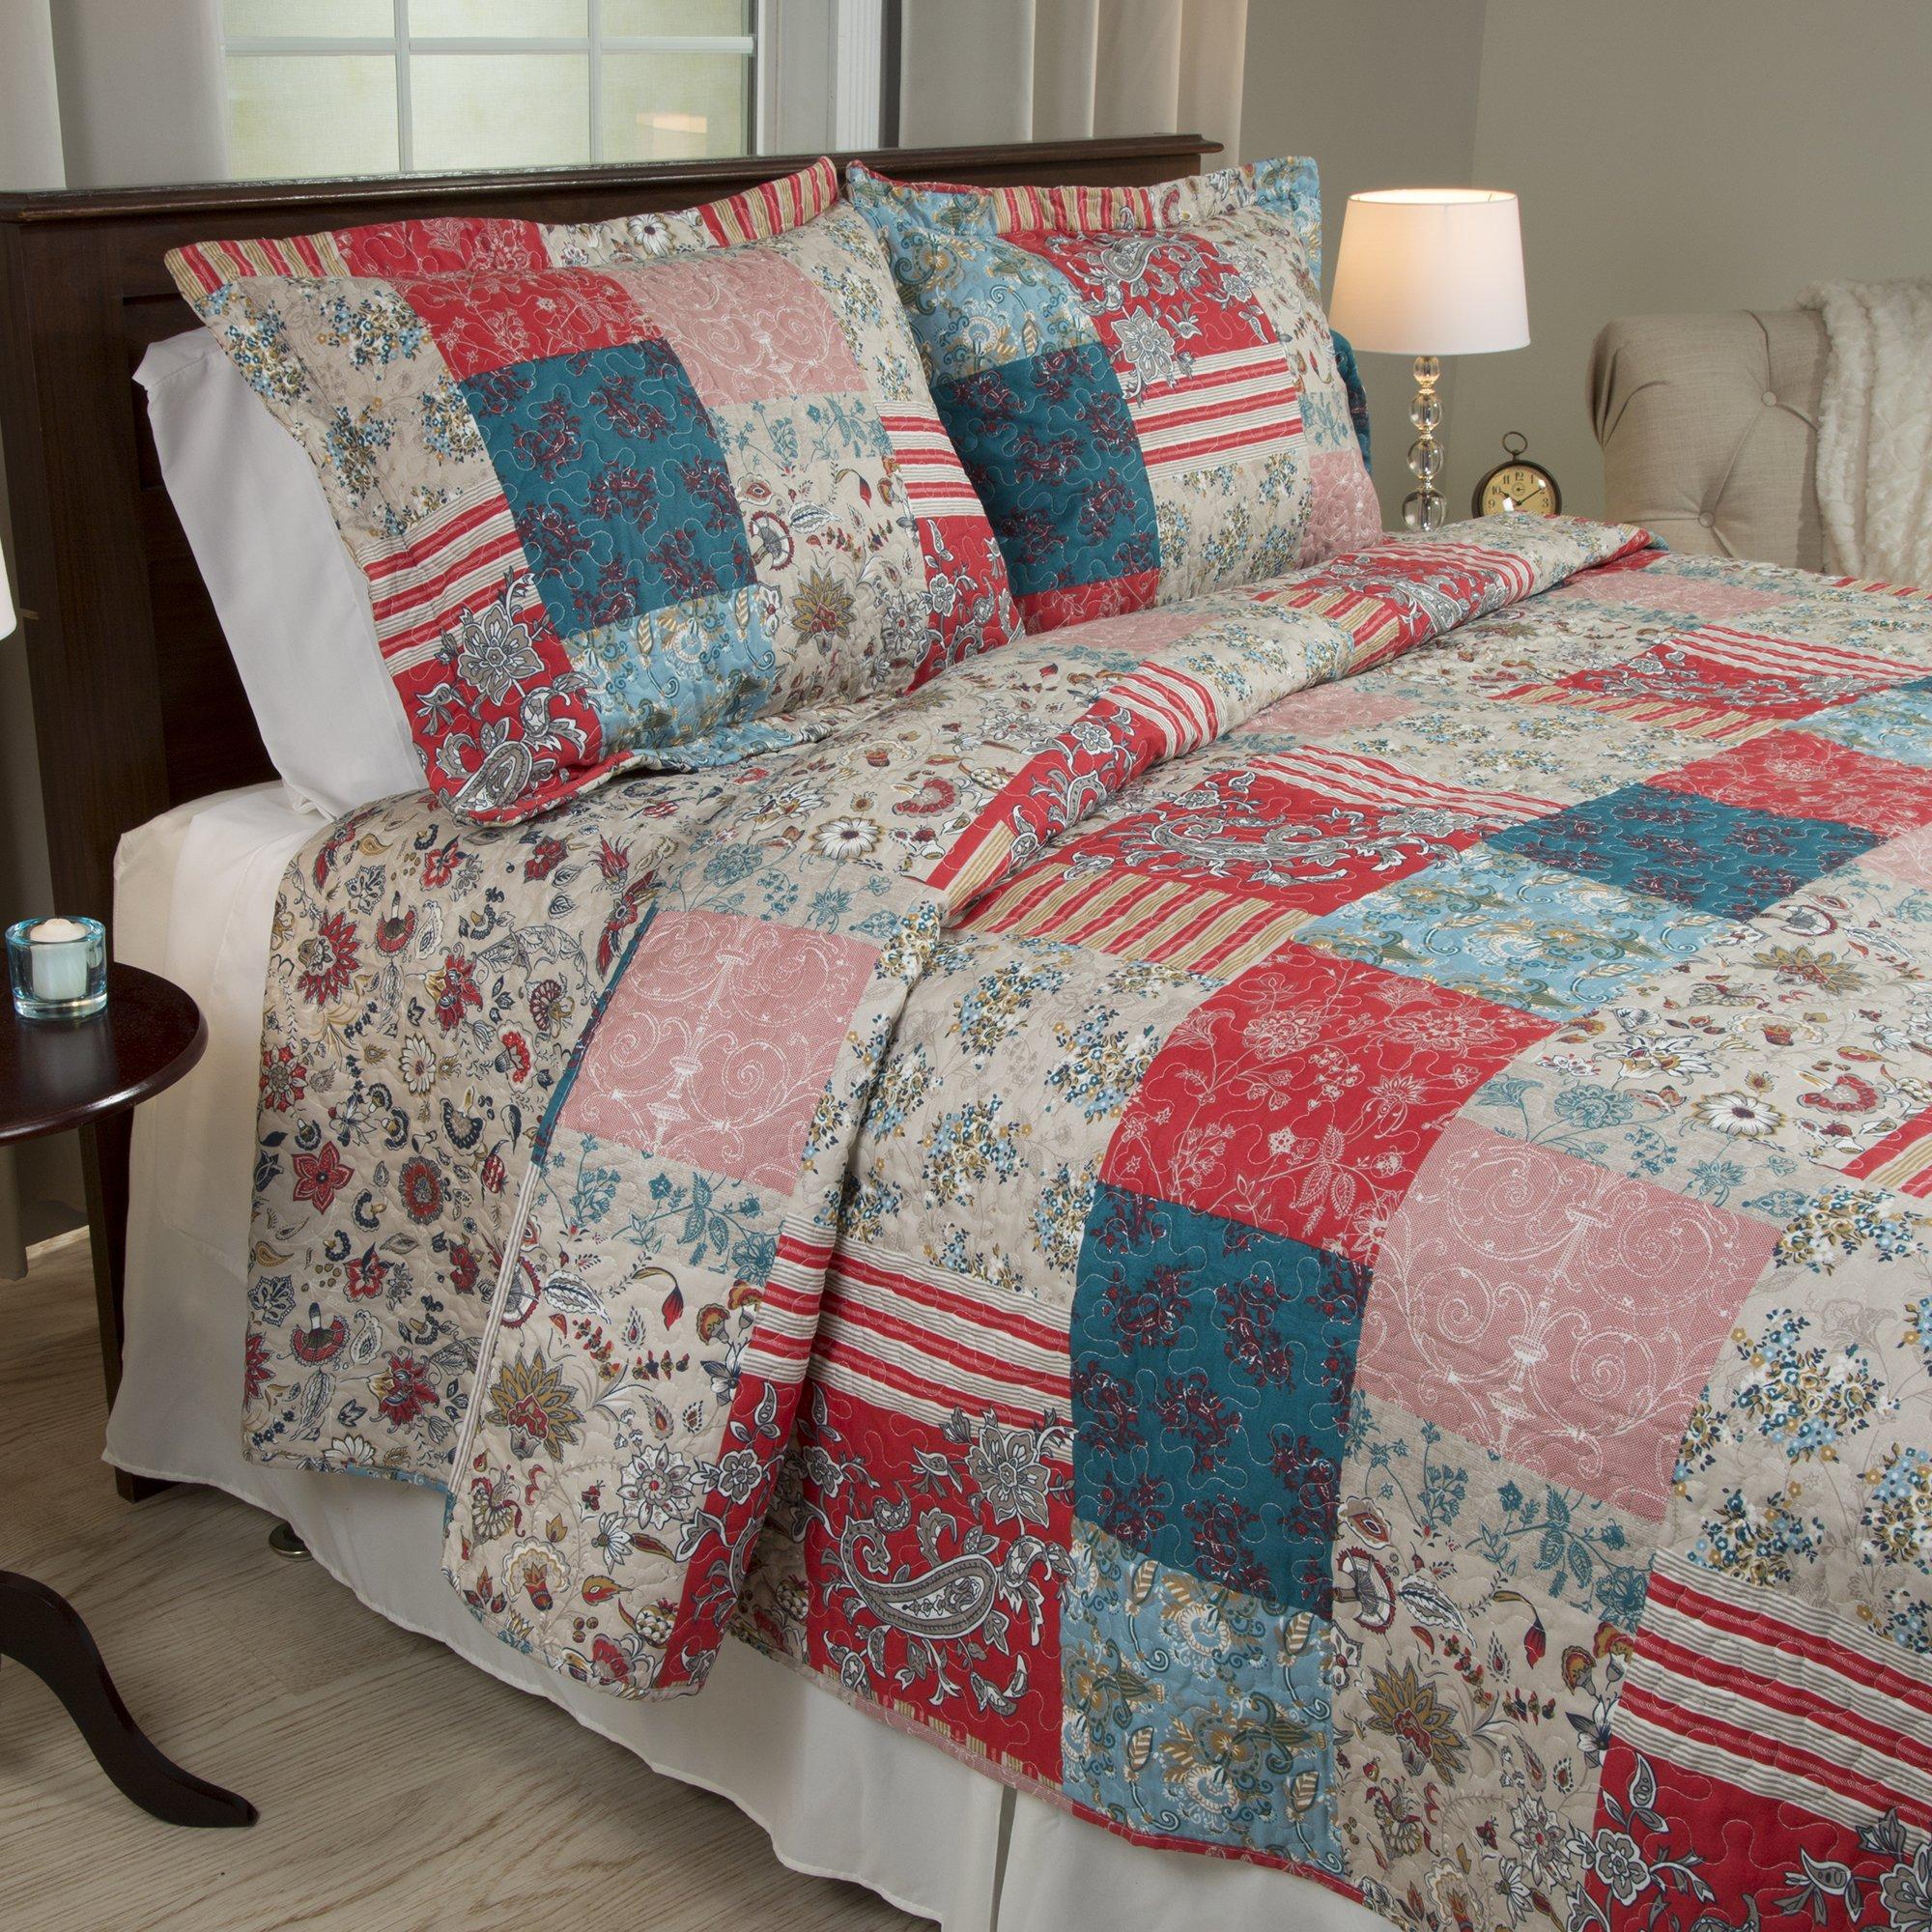 Amazon Com Lavish Home 66 10039 Fq 3 Piece Mallory Quilt Set Full Queen Home Kitchen